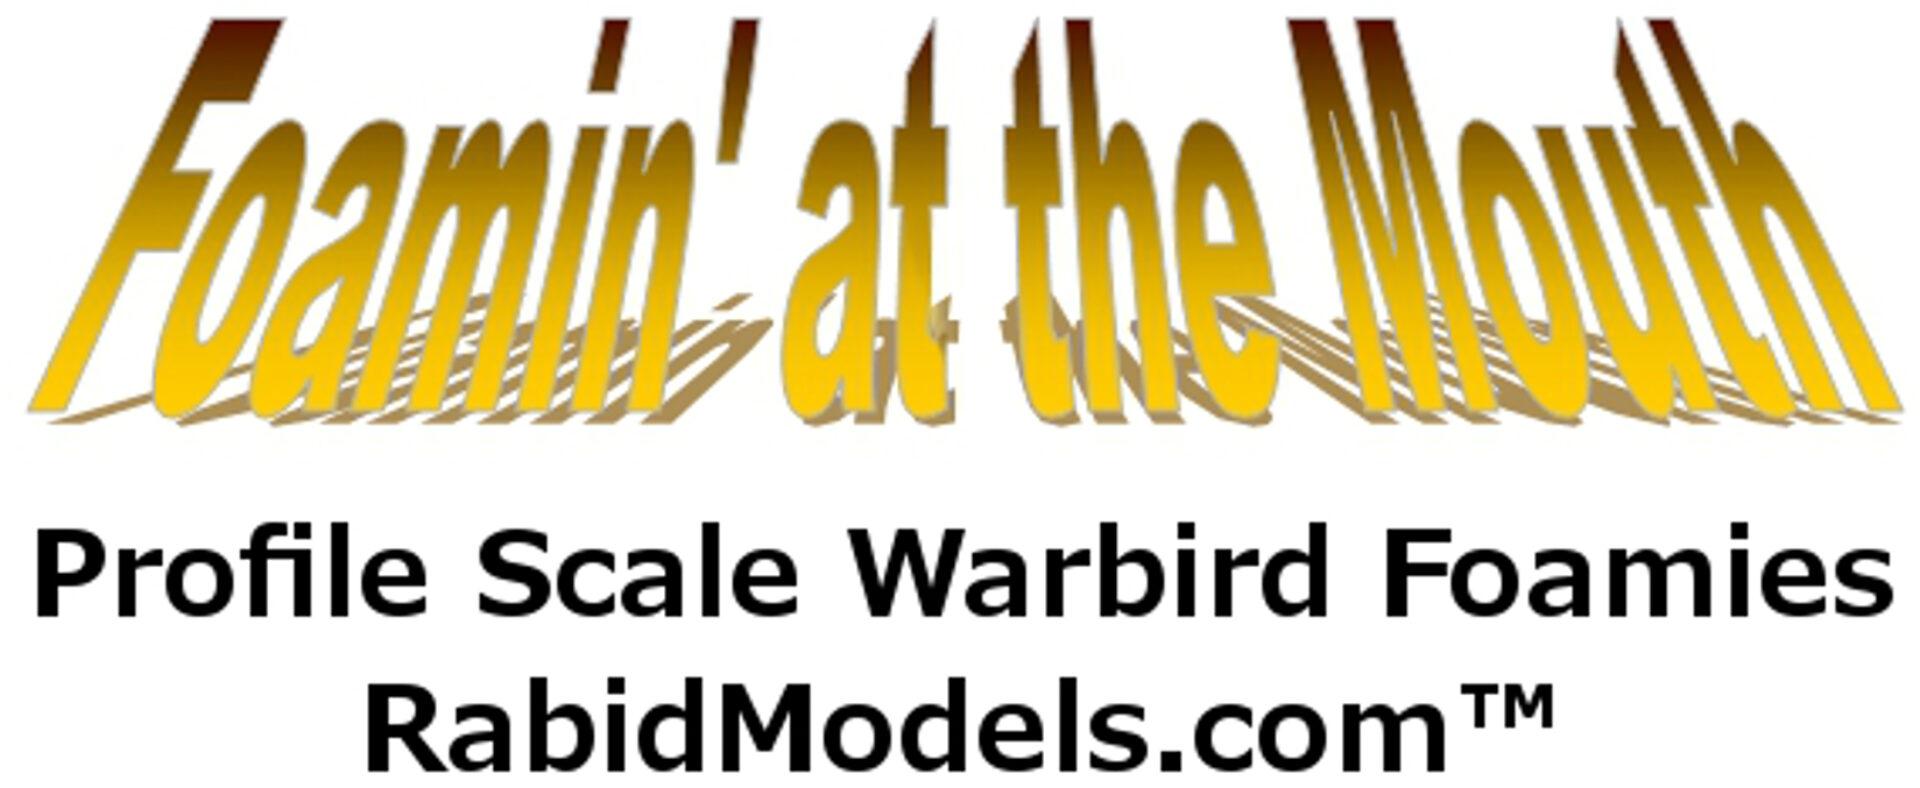 Rabid Models -- UNDER CONSTRUCTION